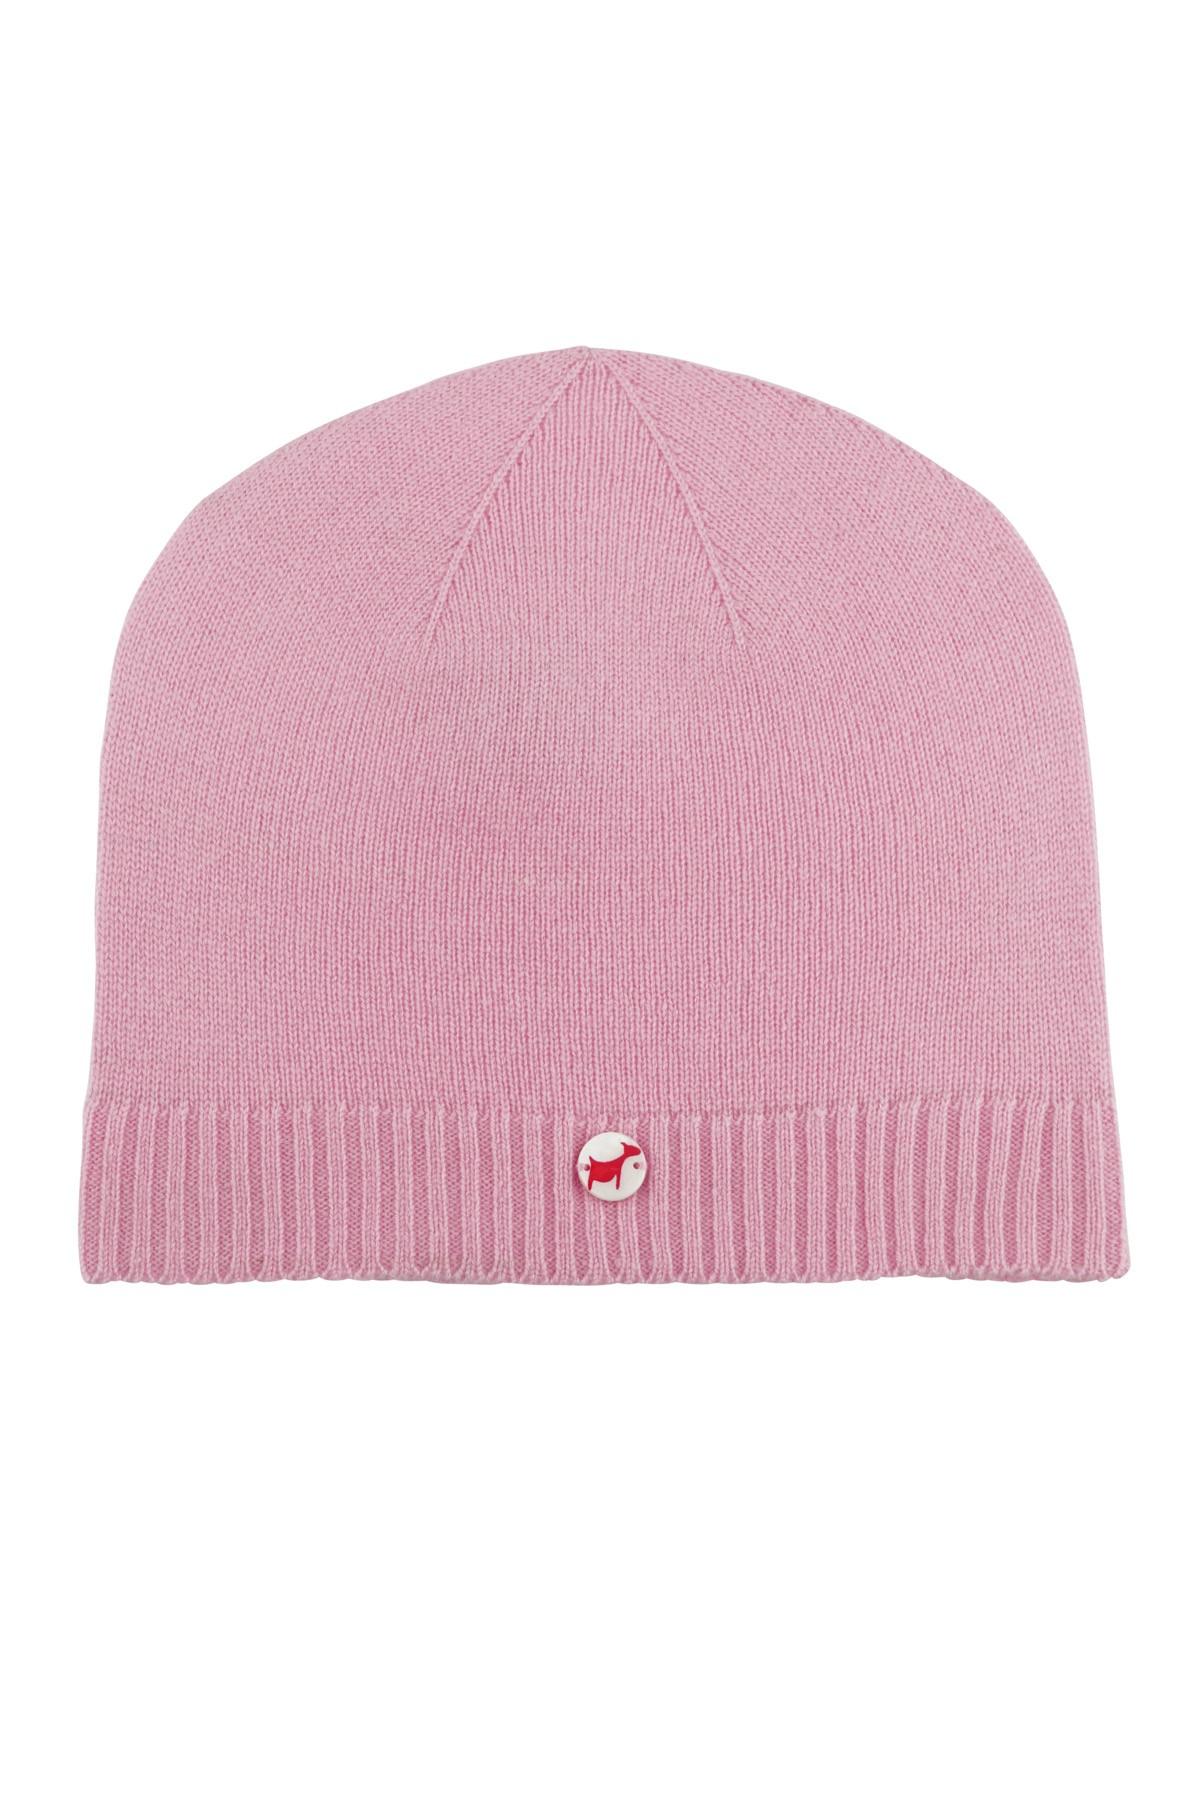 Kaschmirmütze Feinstrick rosy pink